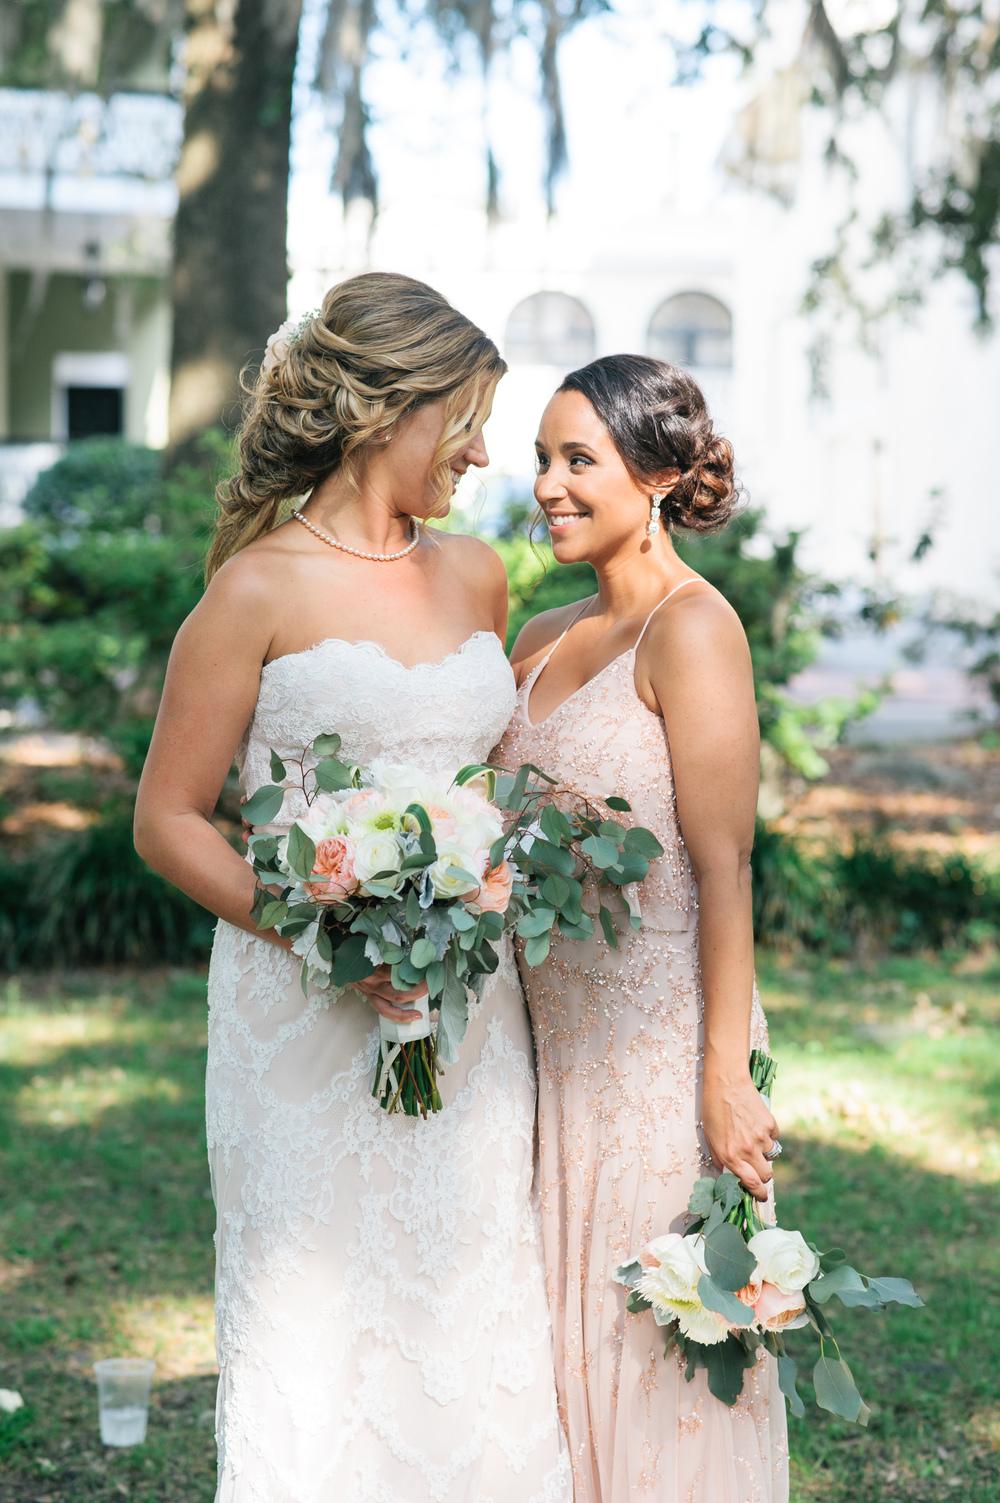 kacey-and-niall-June-4-savanna-georgia-wedding-m-newsom-photography- (497 of 961).jpg